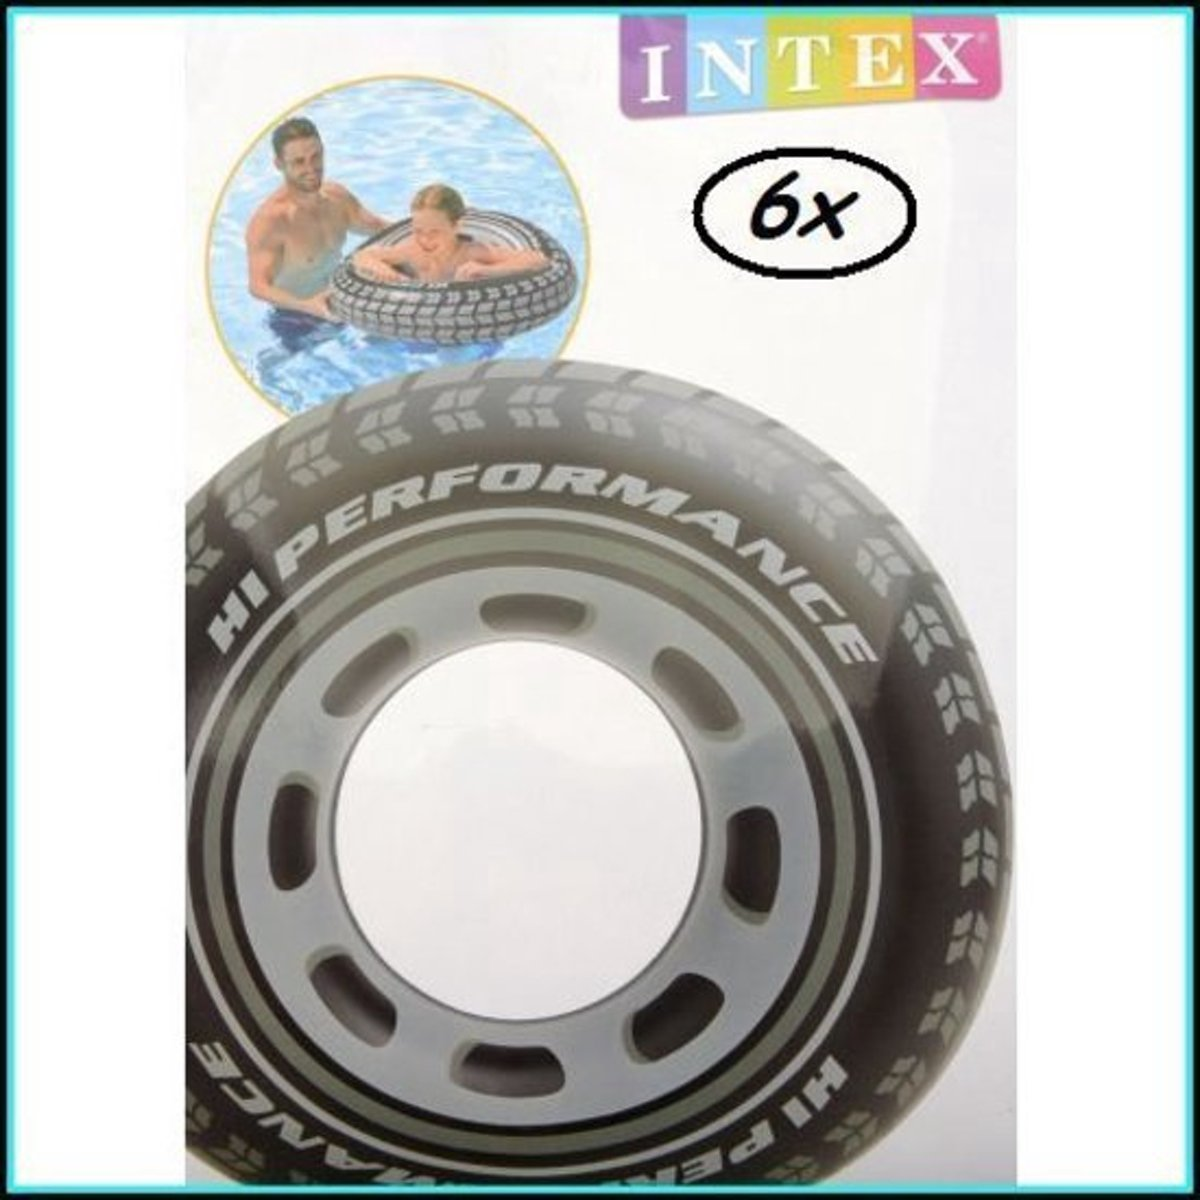 6x Intex Giant Autoband - Zwemband - 91 cm